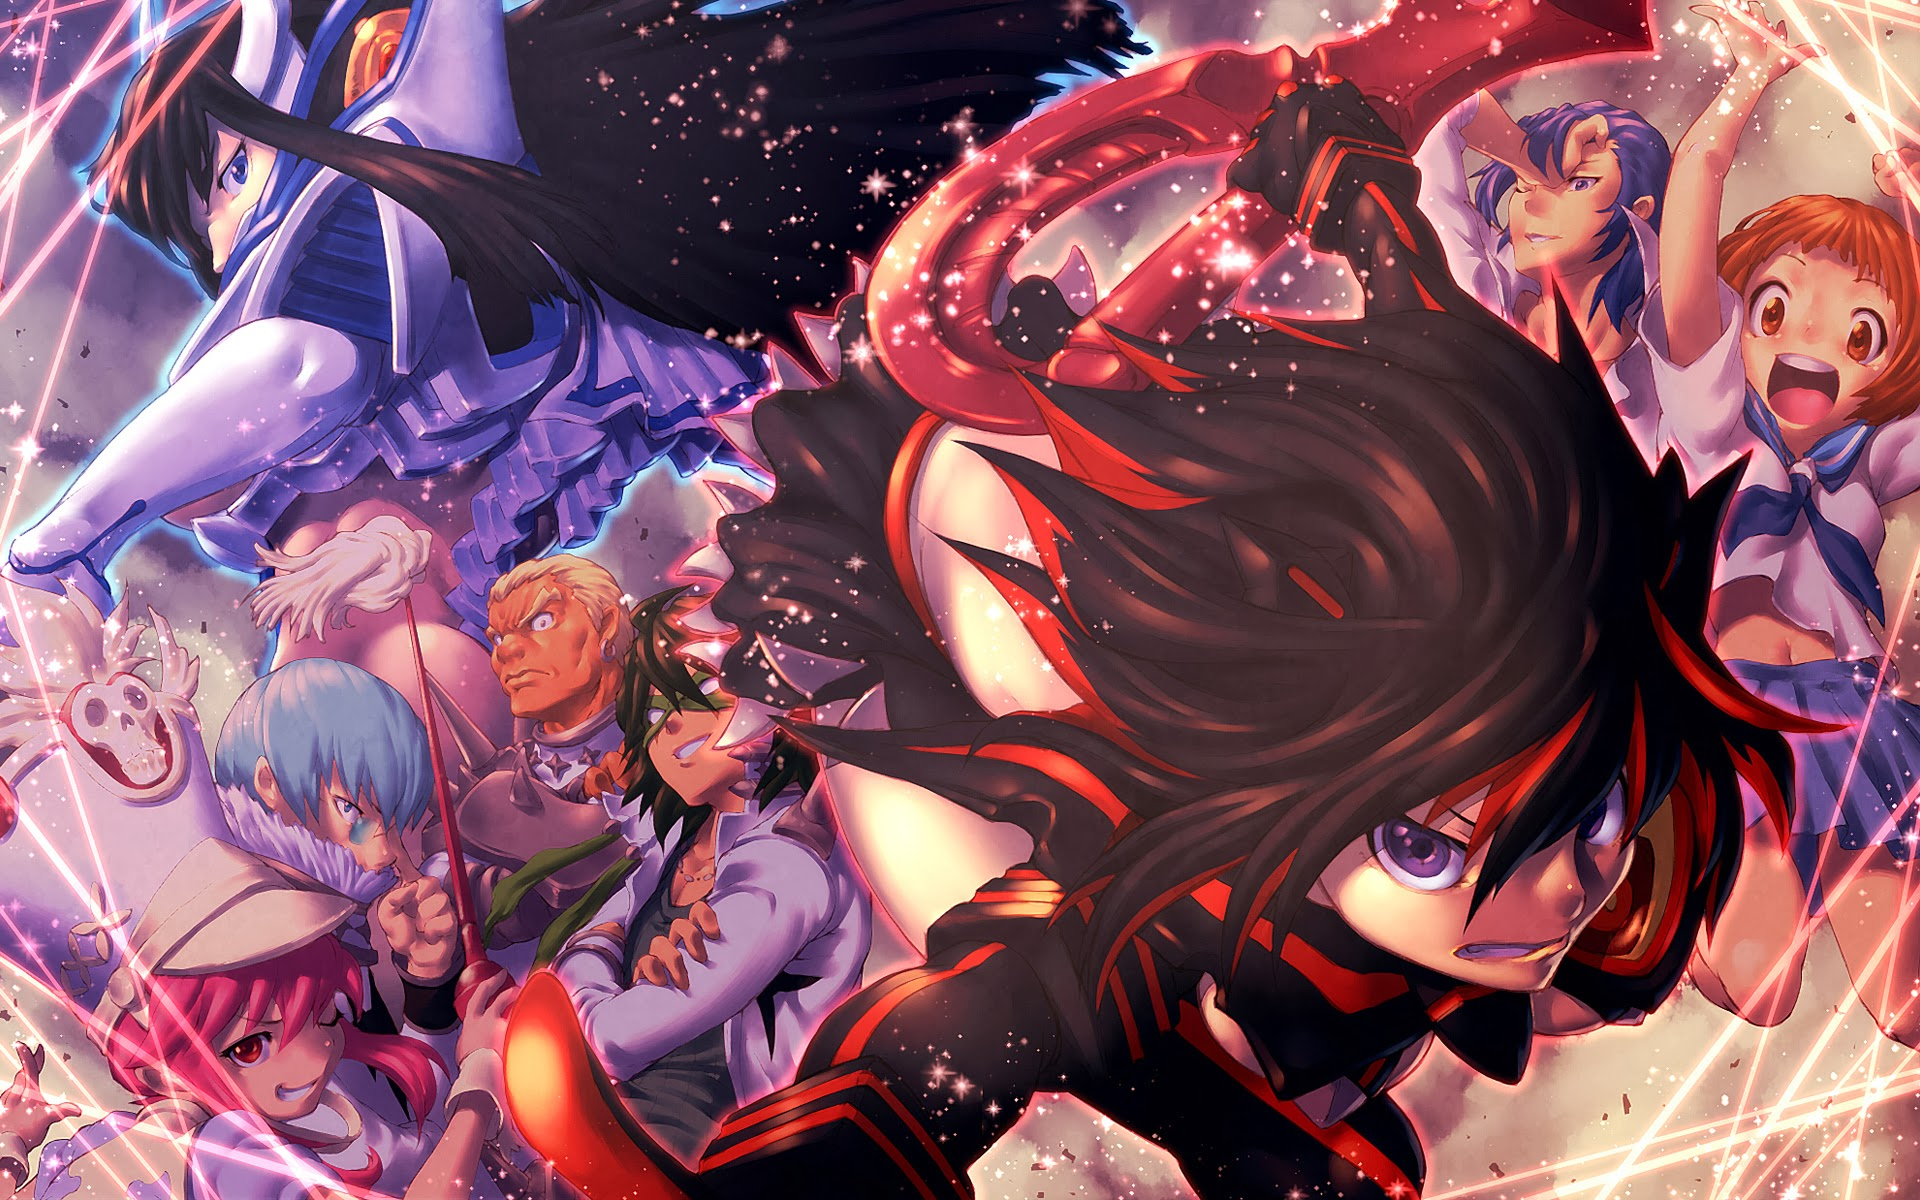 Anime Manga Kill La Kill Anime Character Anime Girls Anime Art 1920x1200